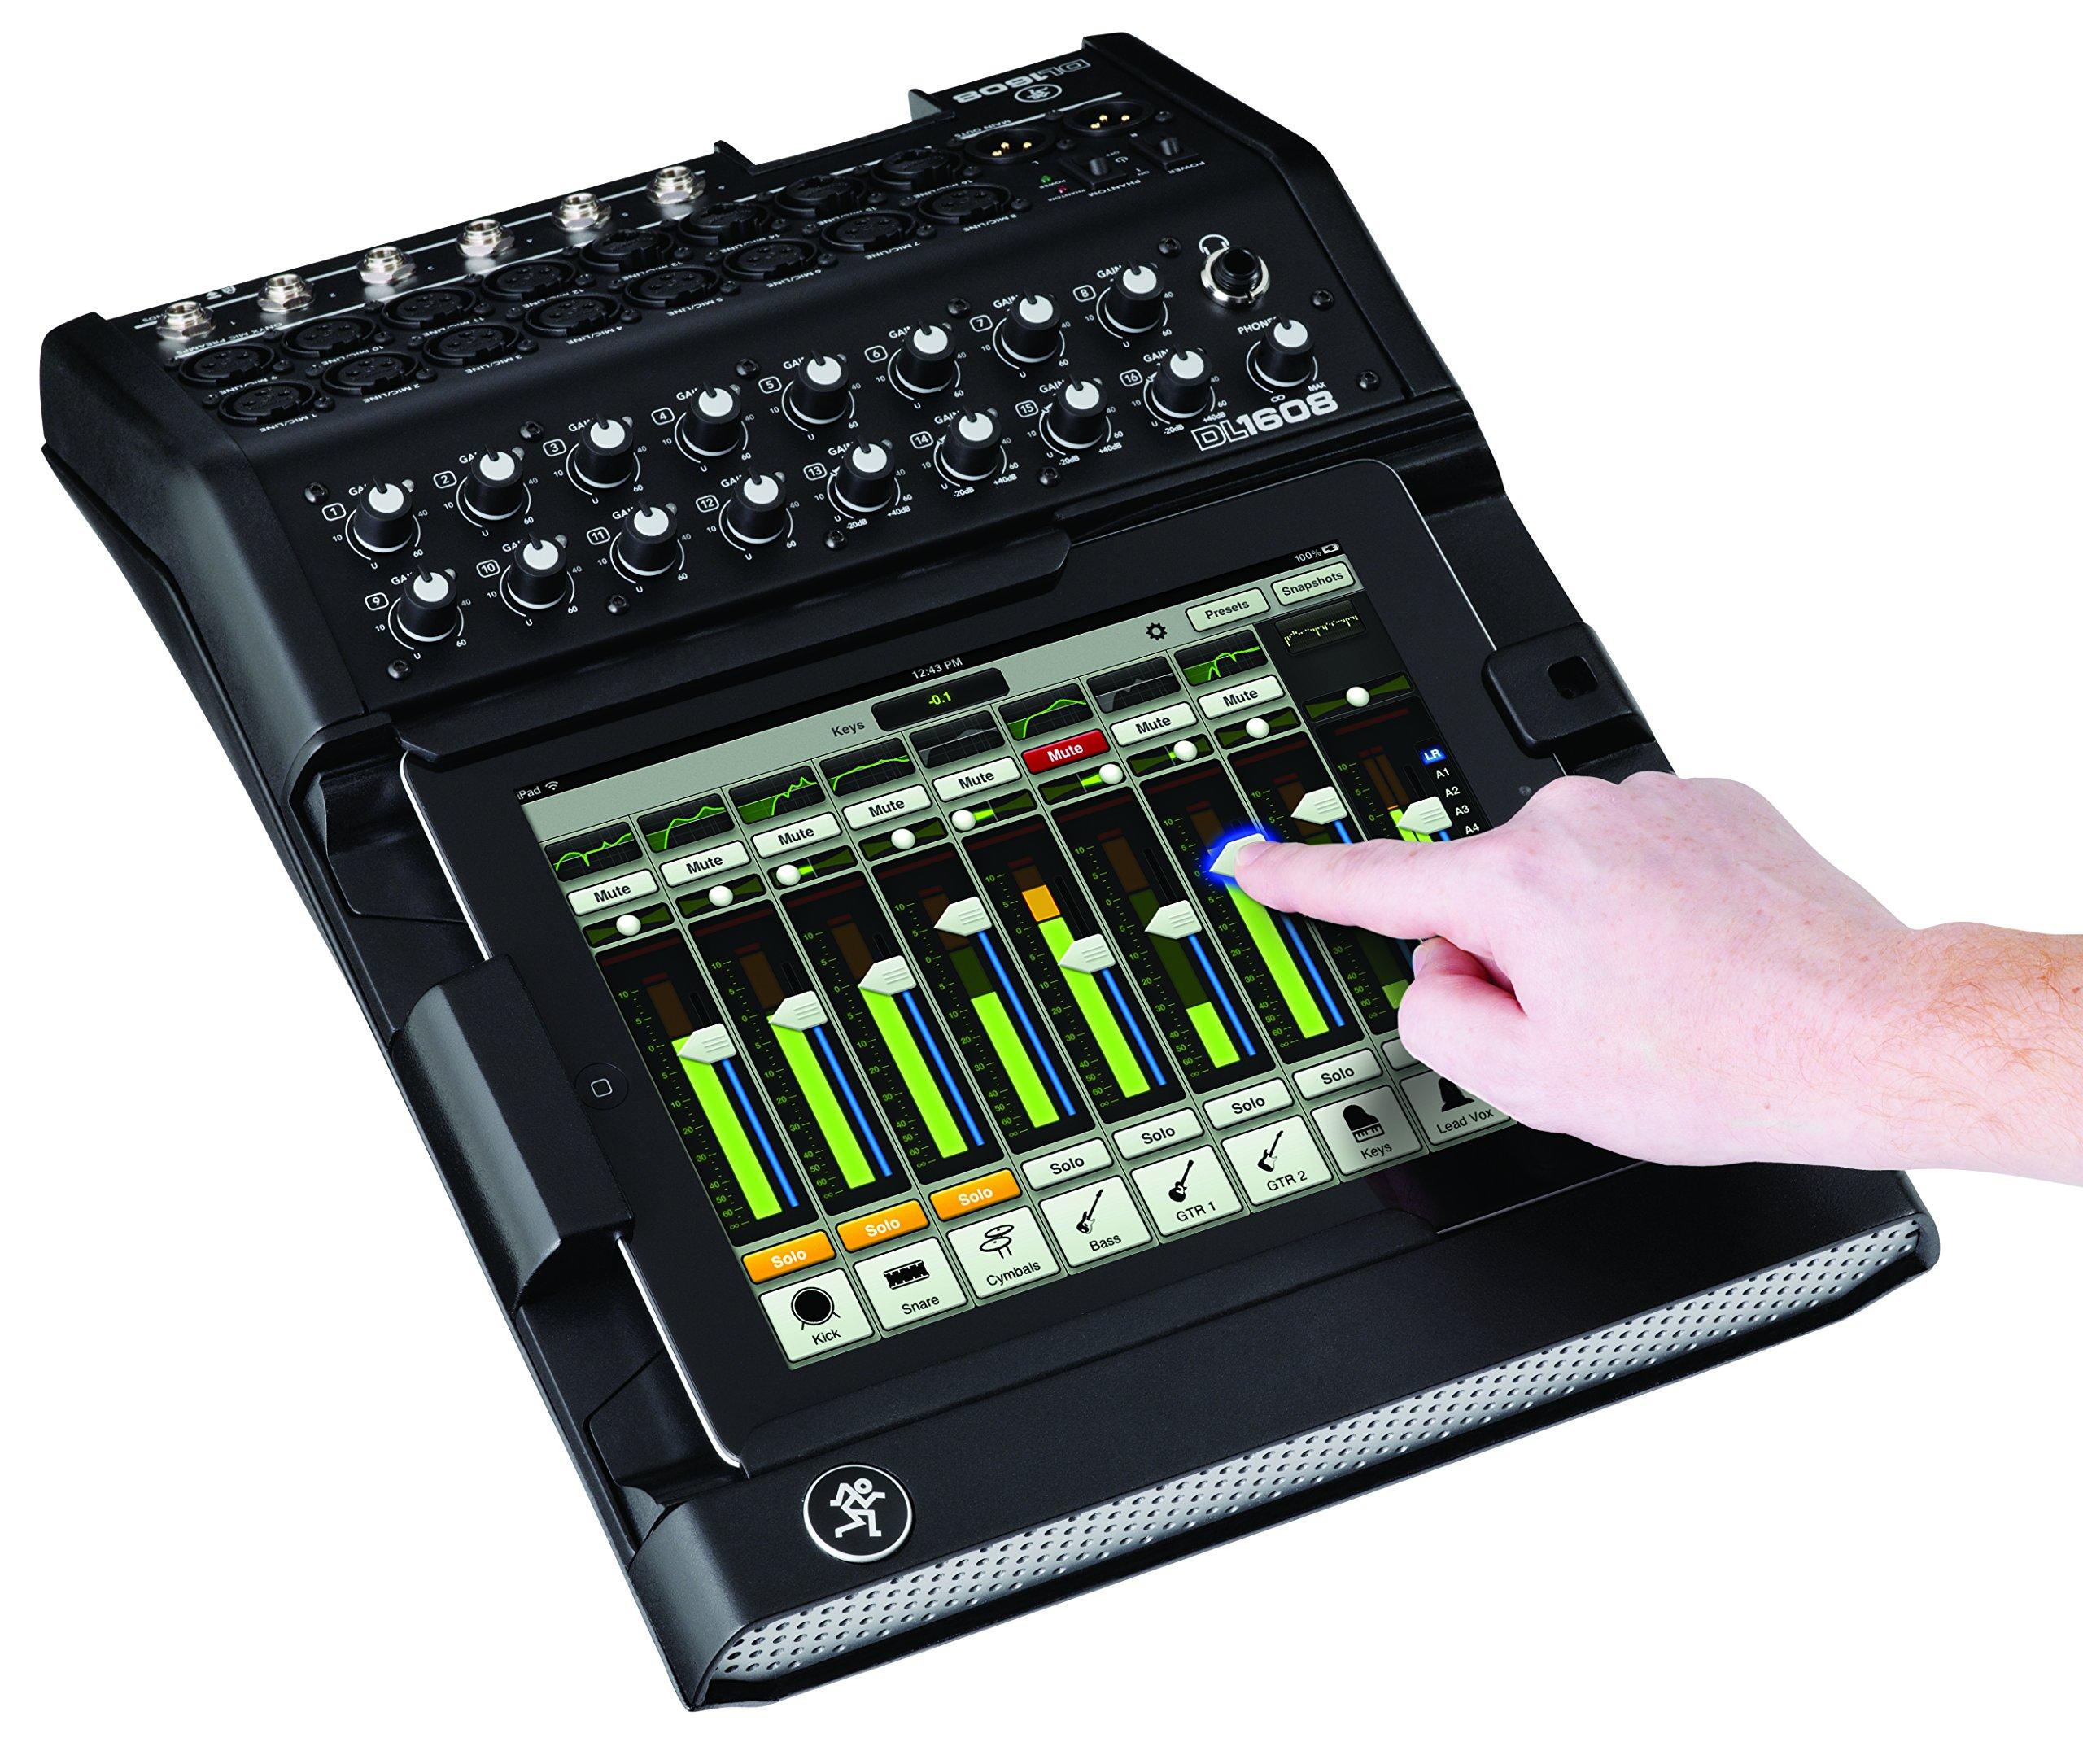 Mackie, Digital Mixer, Black, 16-channel (2044387-00)